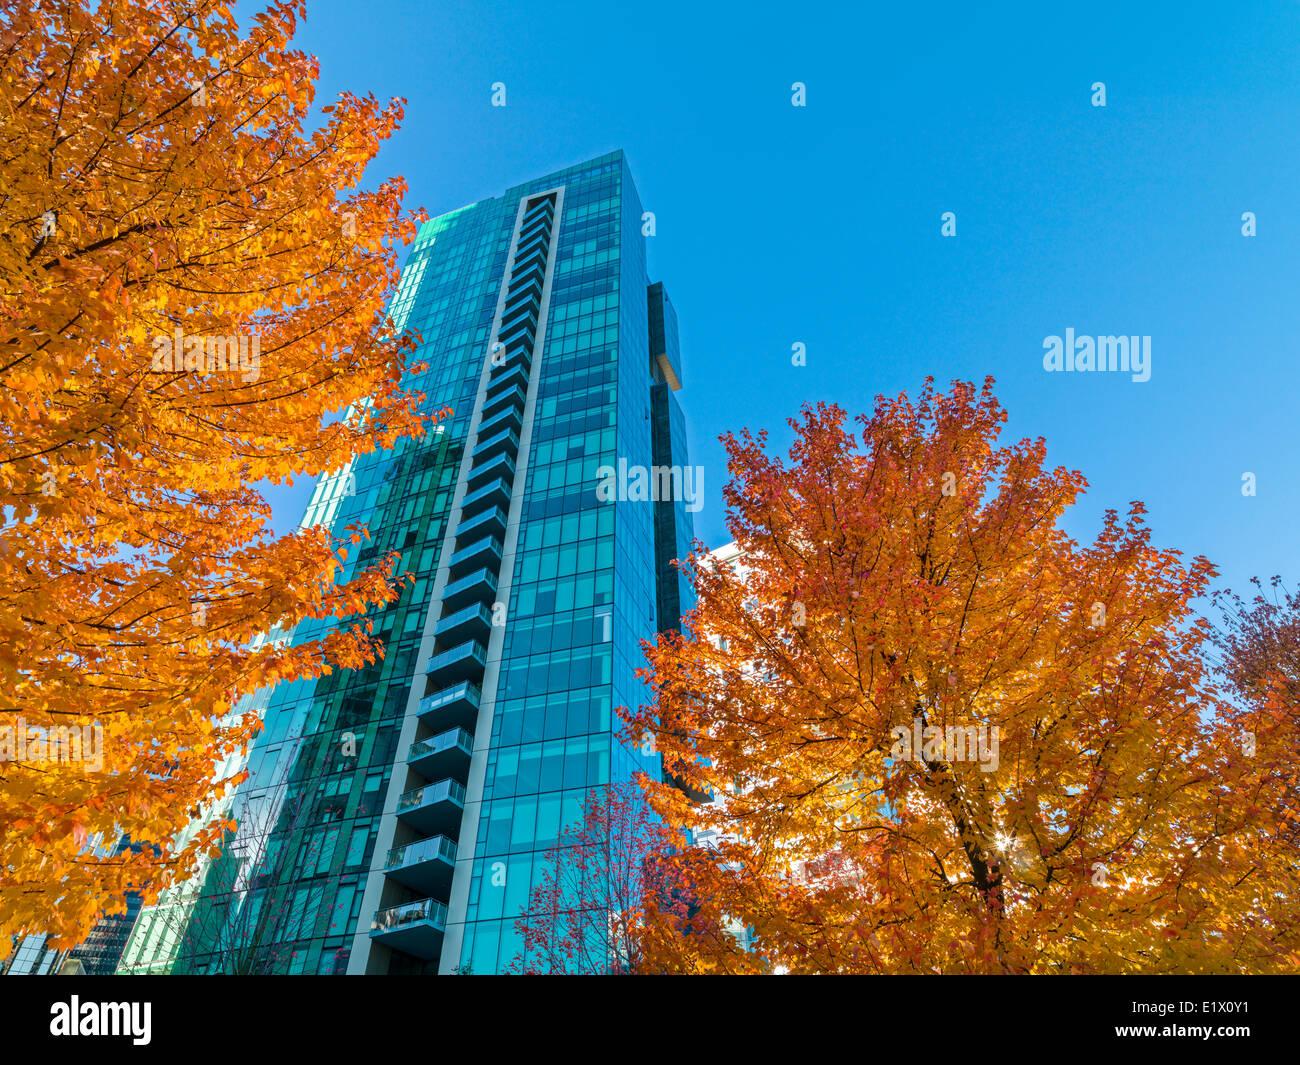 Vancouver Office Tower und Ahorn-Bäume im Herbst, Vancouver, Britisch-Kolumbien, Kanada Stockbild